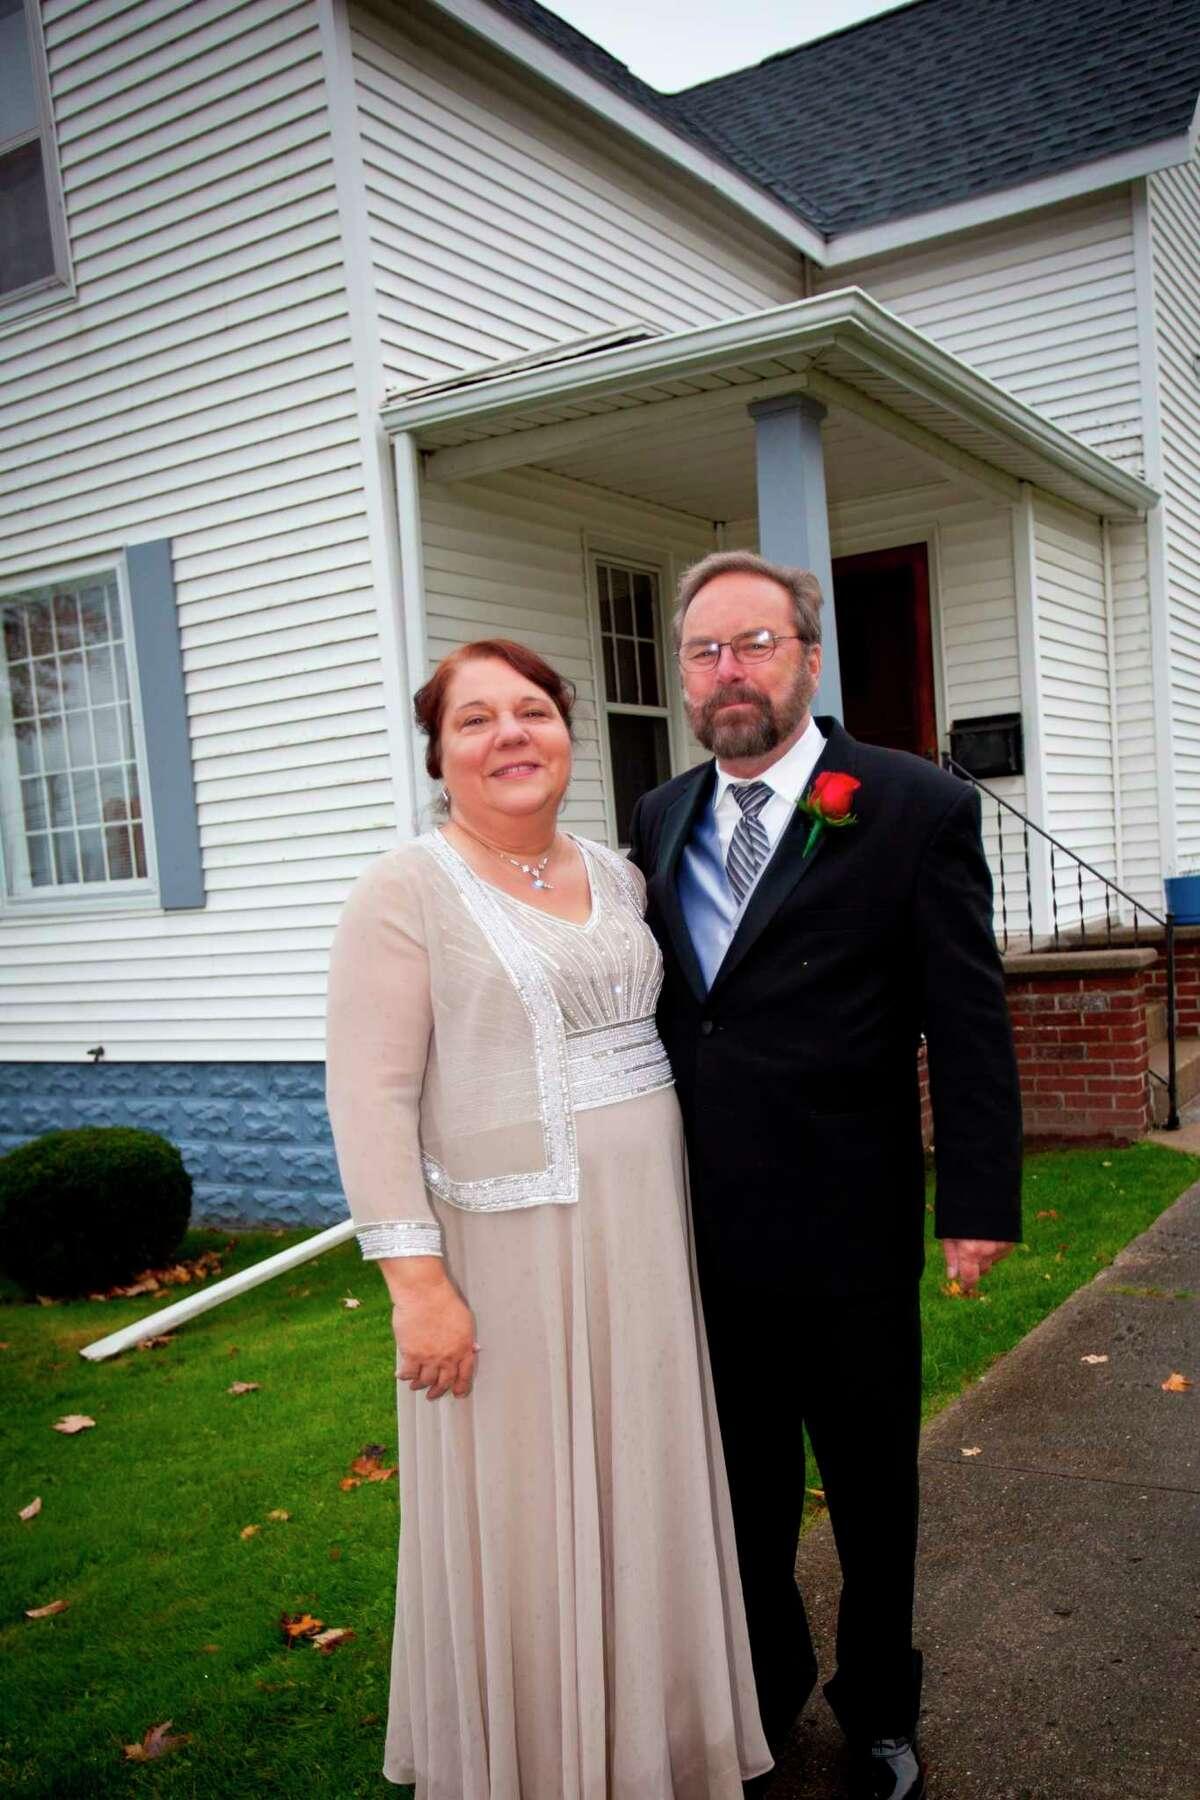 Ken and Karen Libby